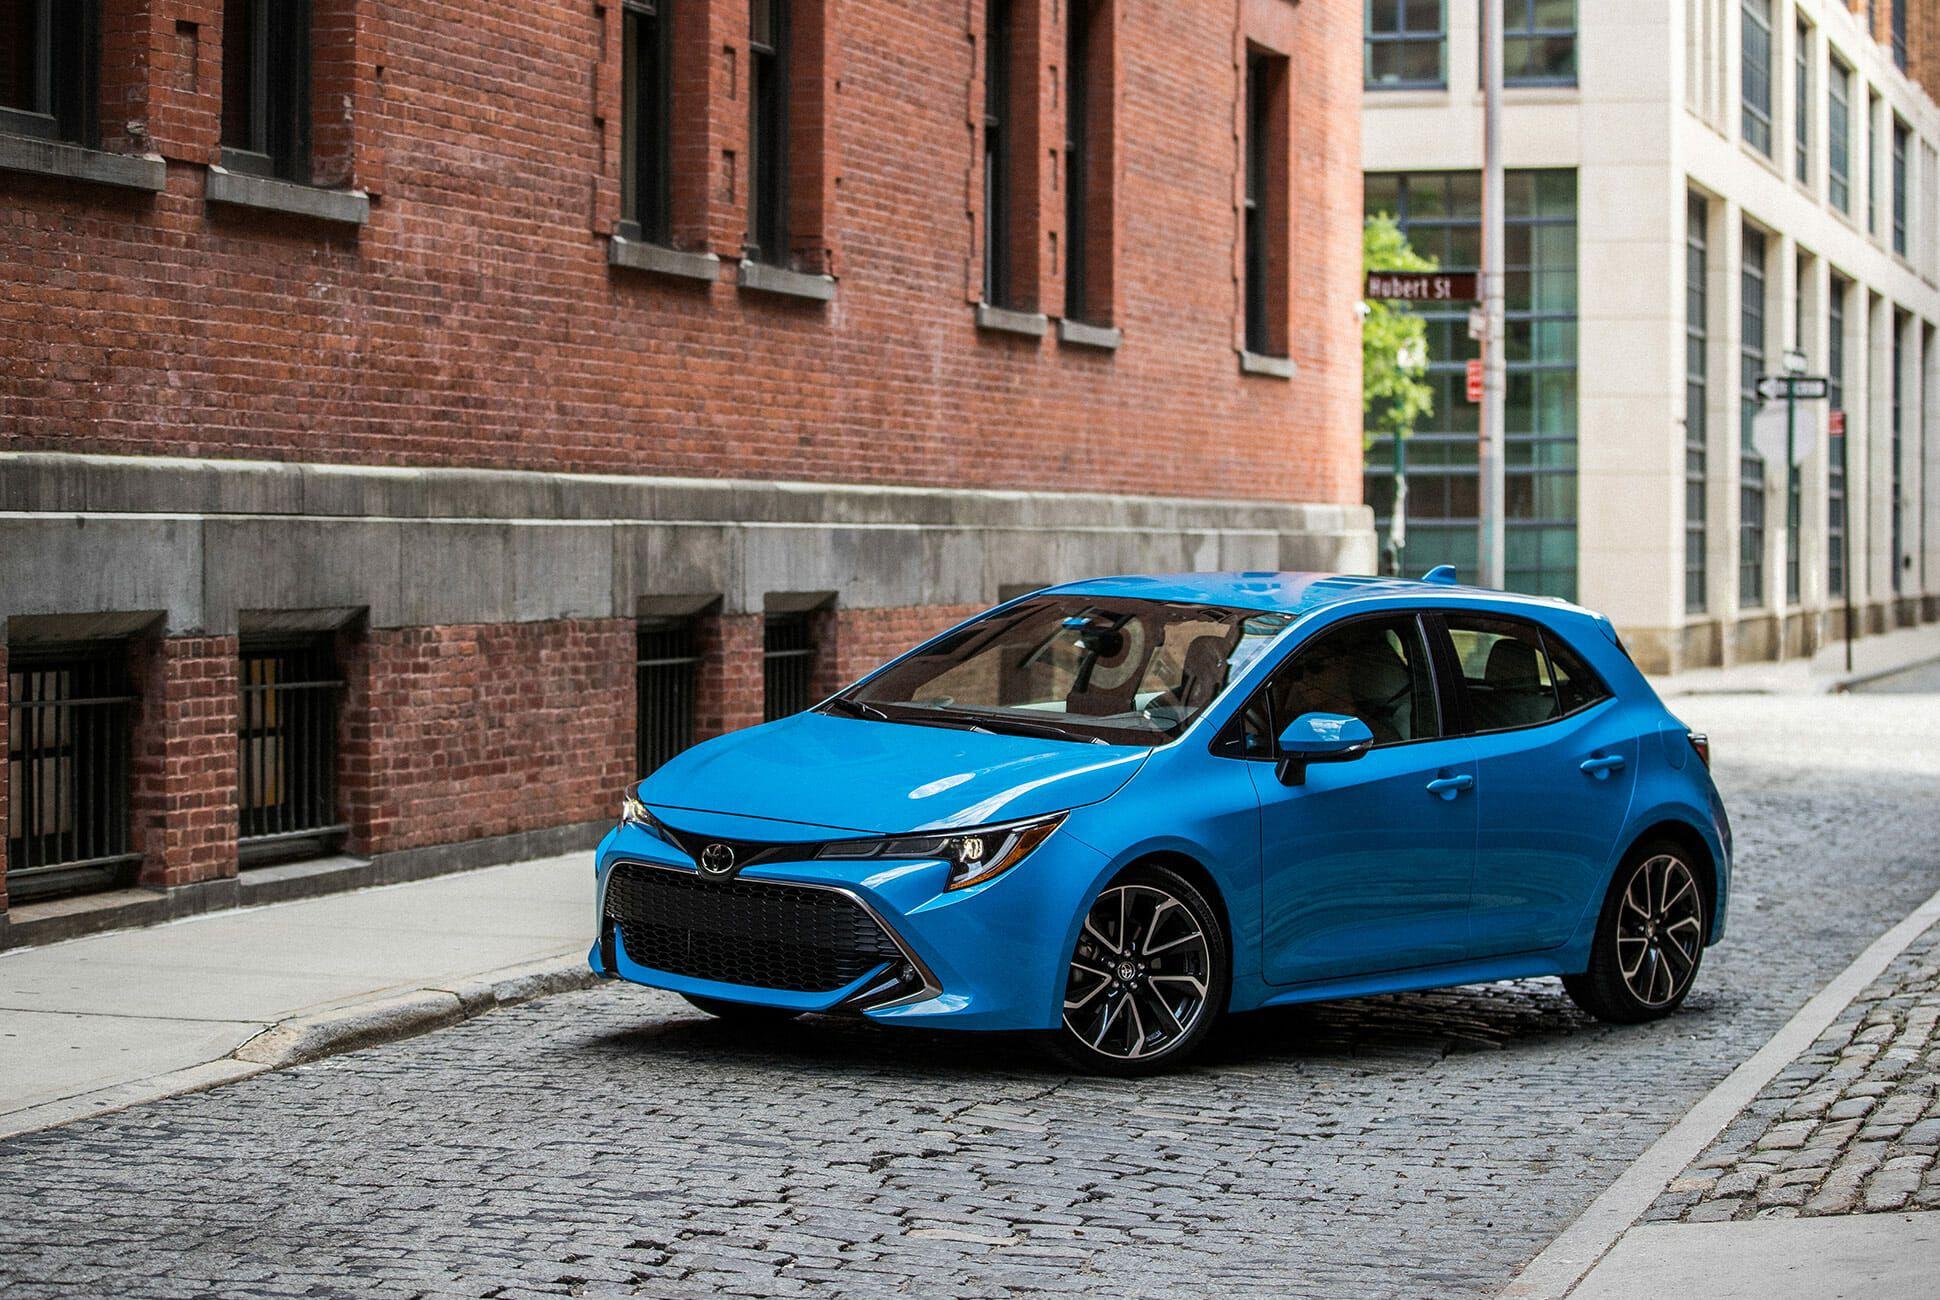 Toyota-Corolla-XSE-Hatch-Review-gear-patrol-slide-3